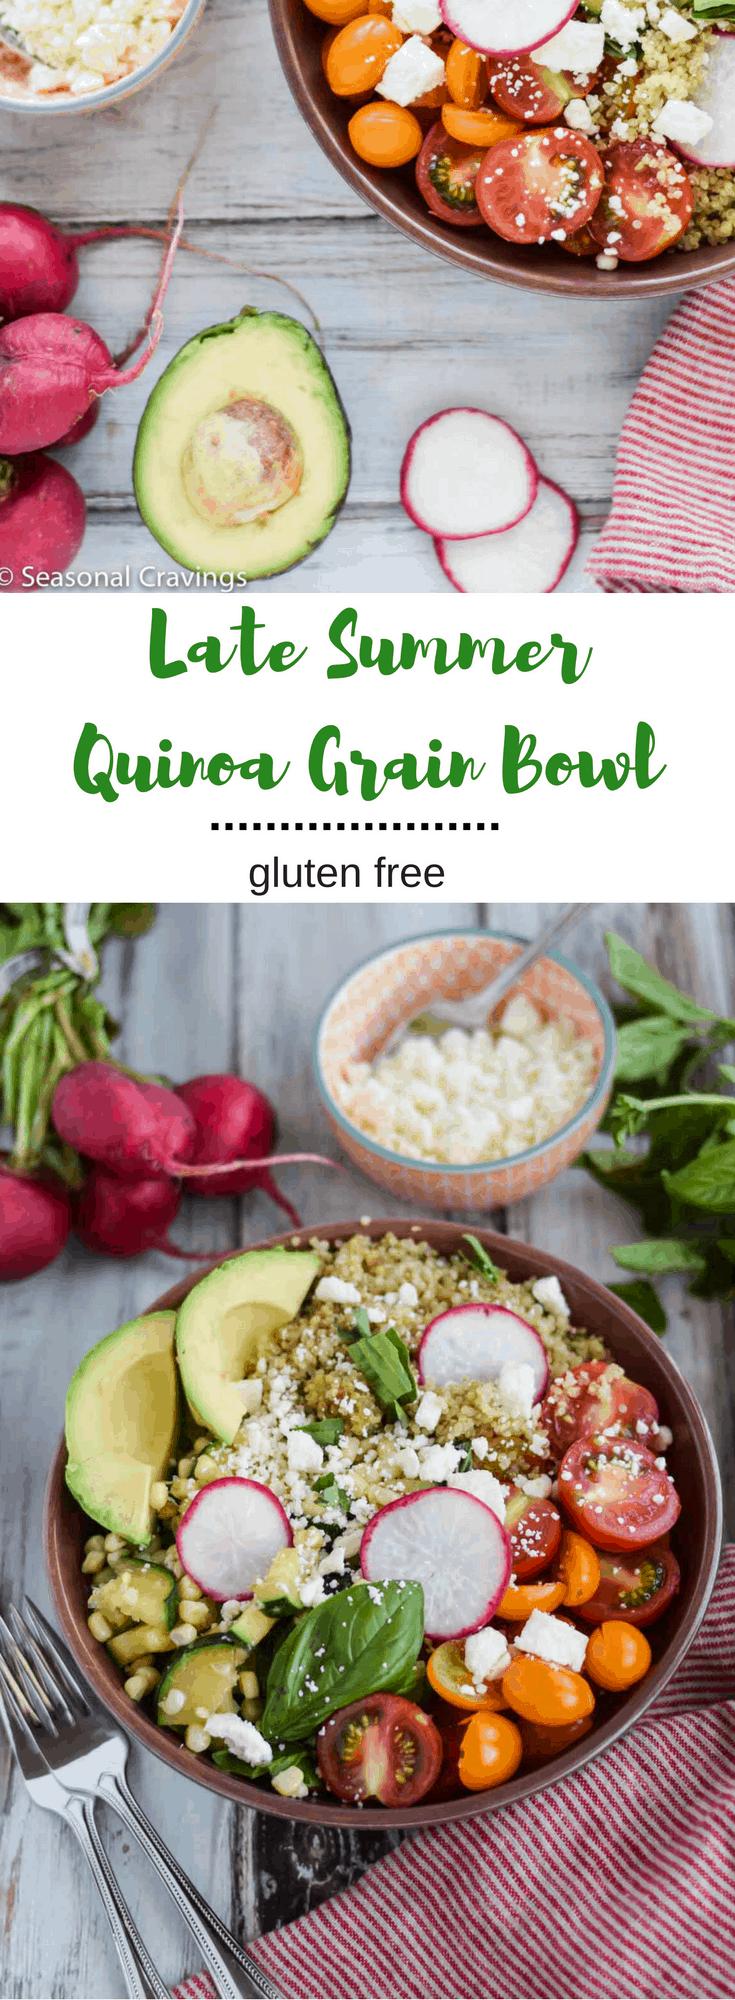 Late Summer Quinoa Grain Bowl